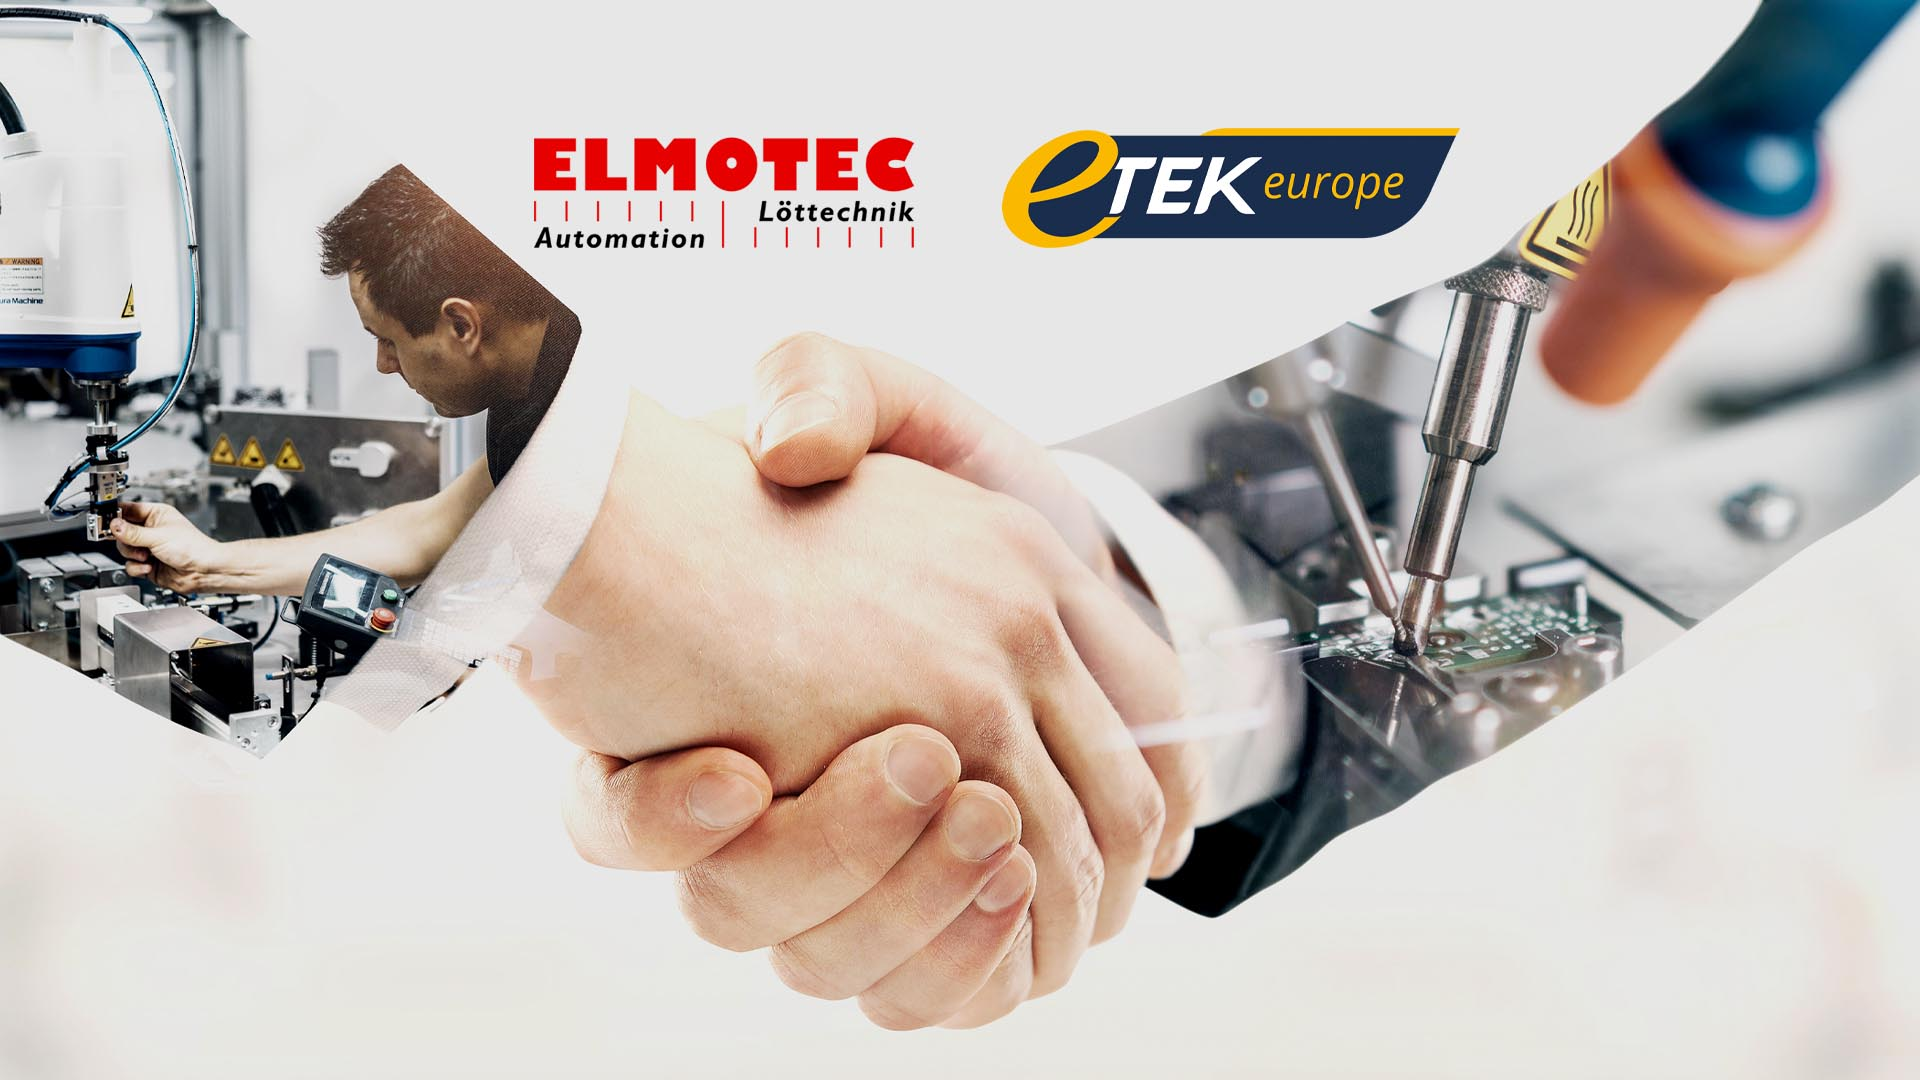 Elmotec and Etek Europe